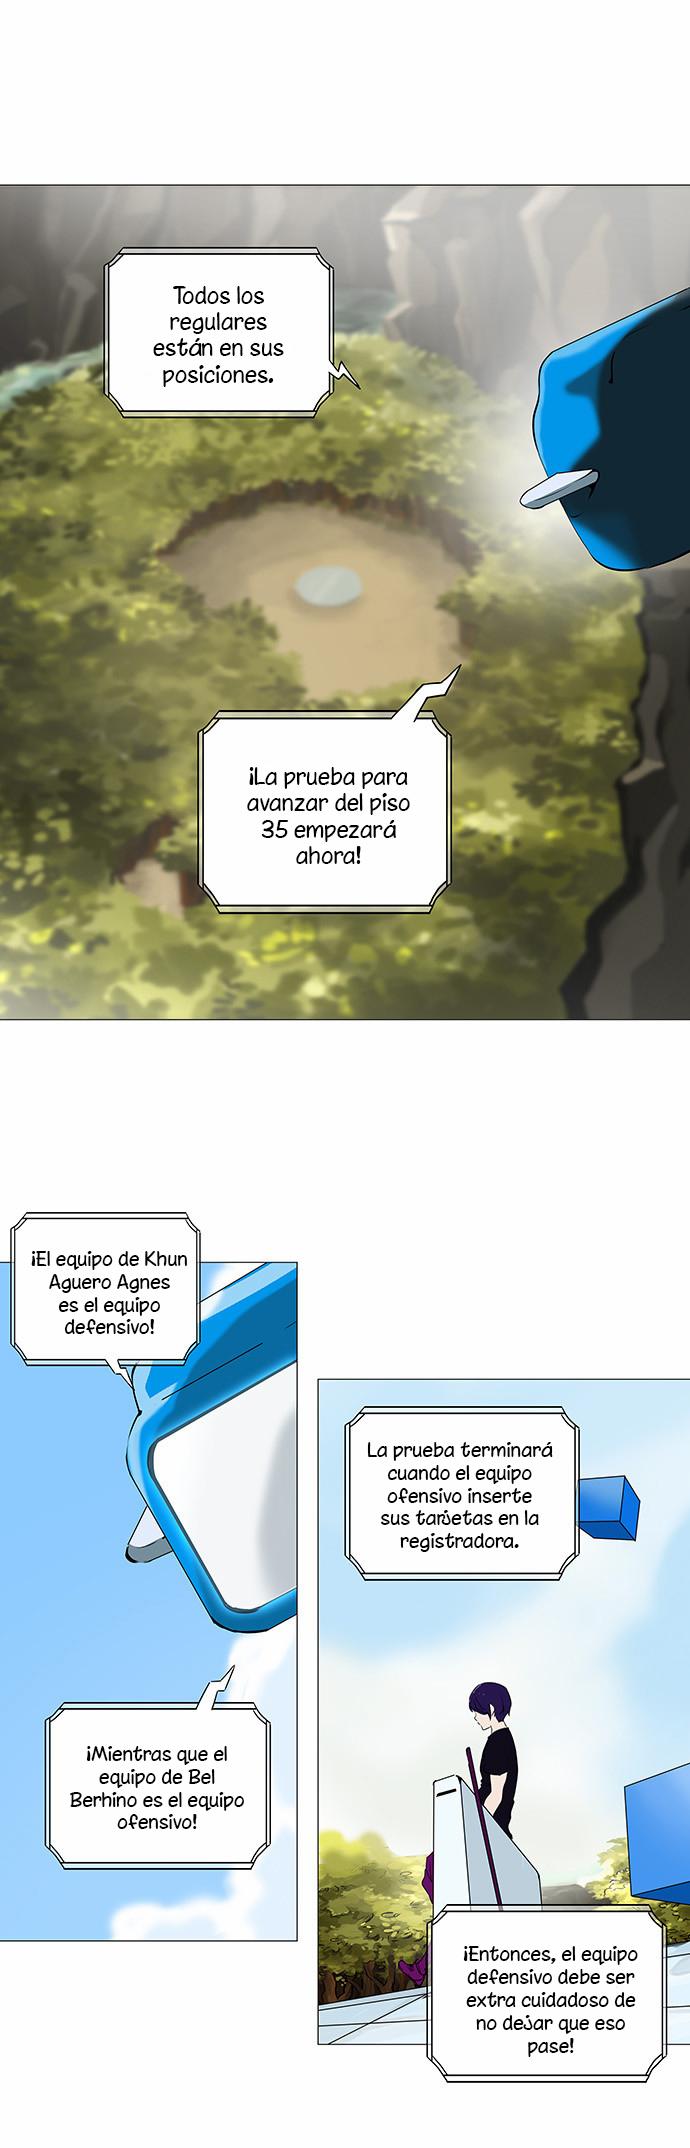 http://c5.ninemanga.com/es_manga/21/149/390897/c782079784c74ffdf81ee12ec6b74512.jpg Page 2